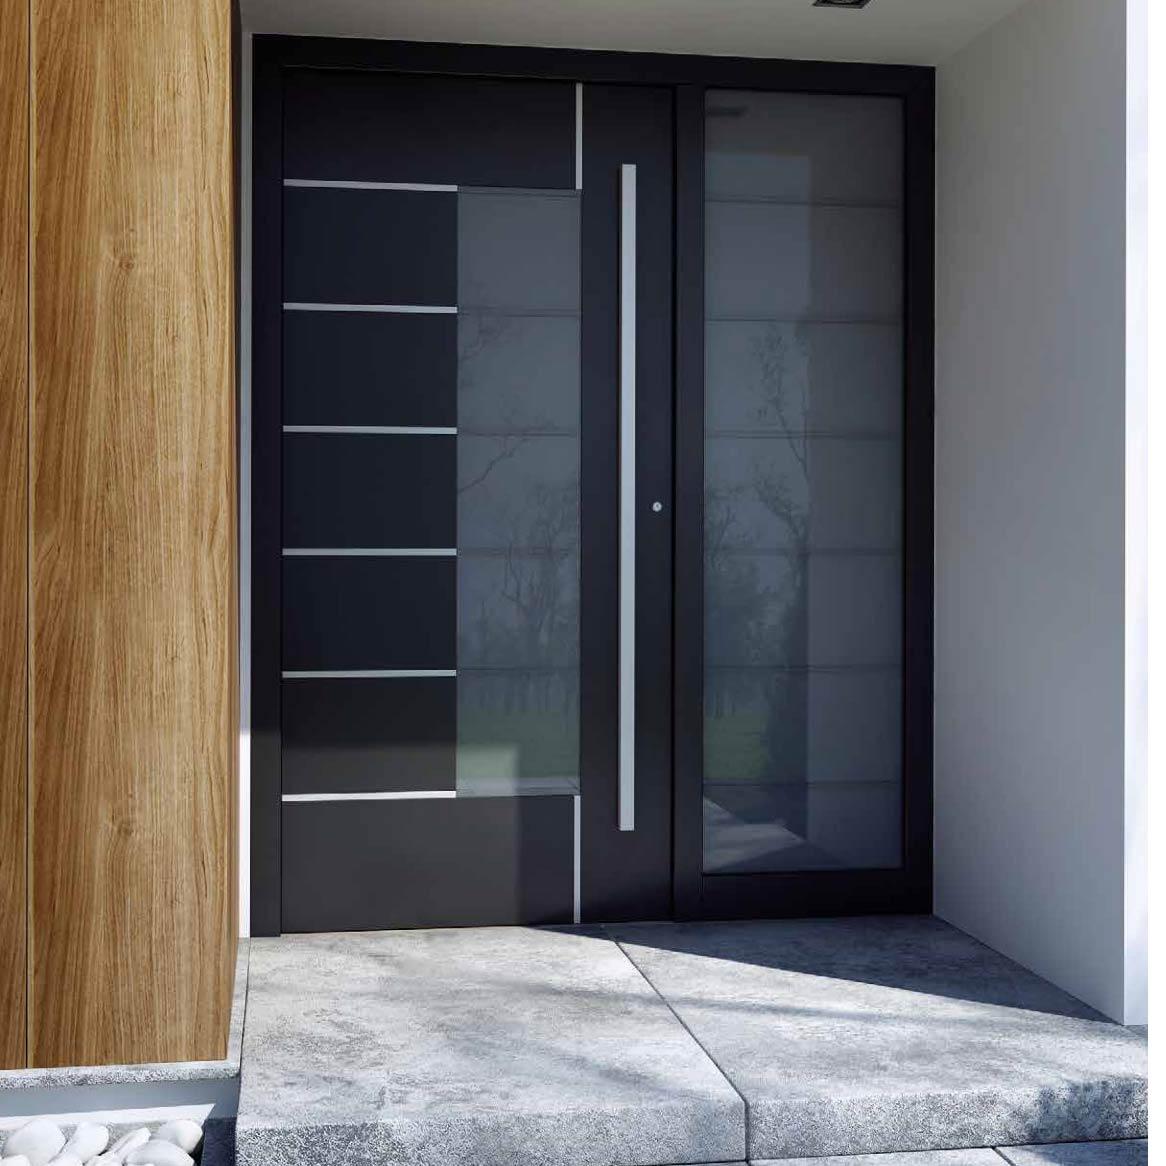 Eingangstür aus Aluminium